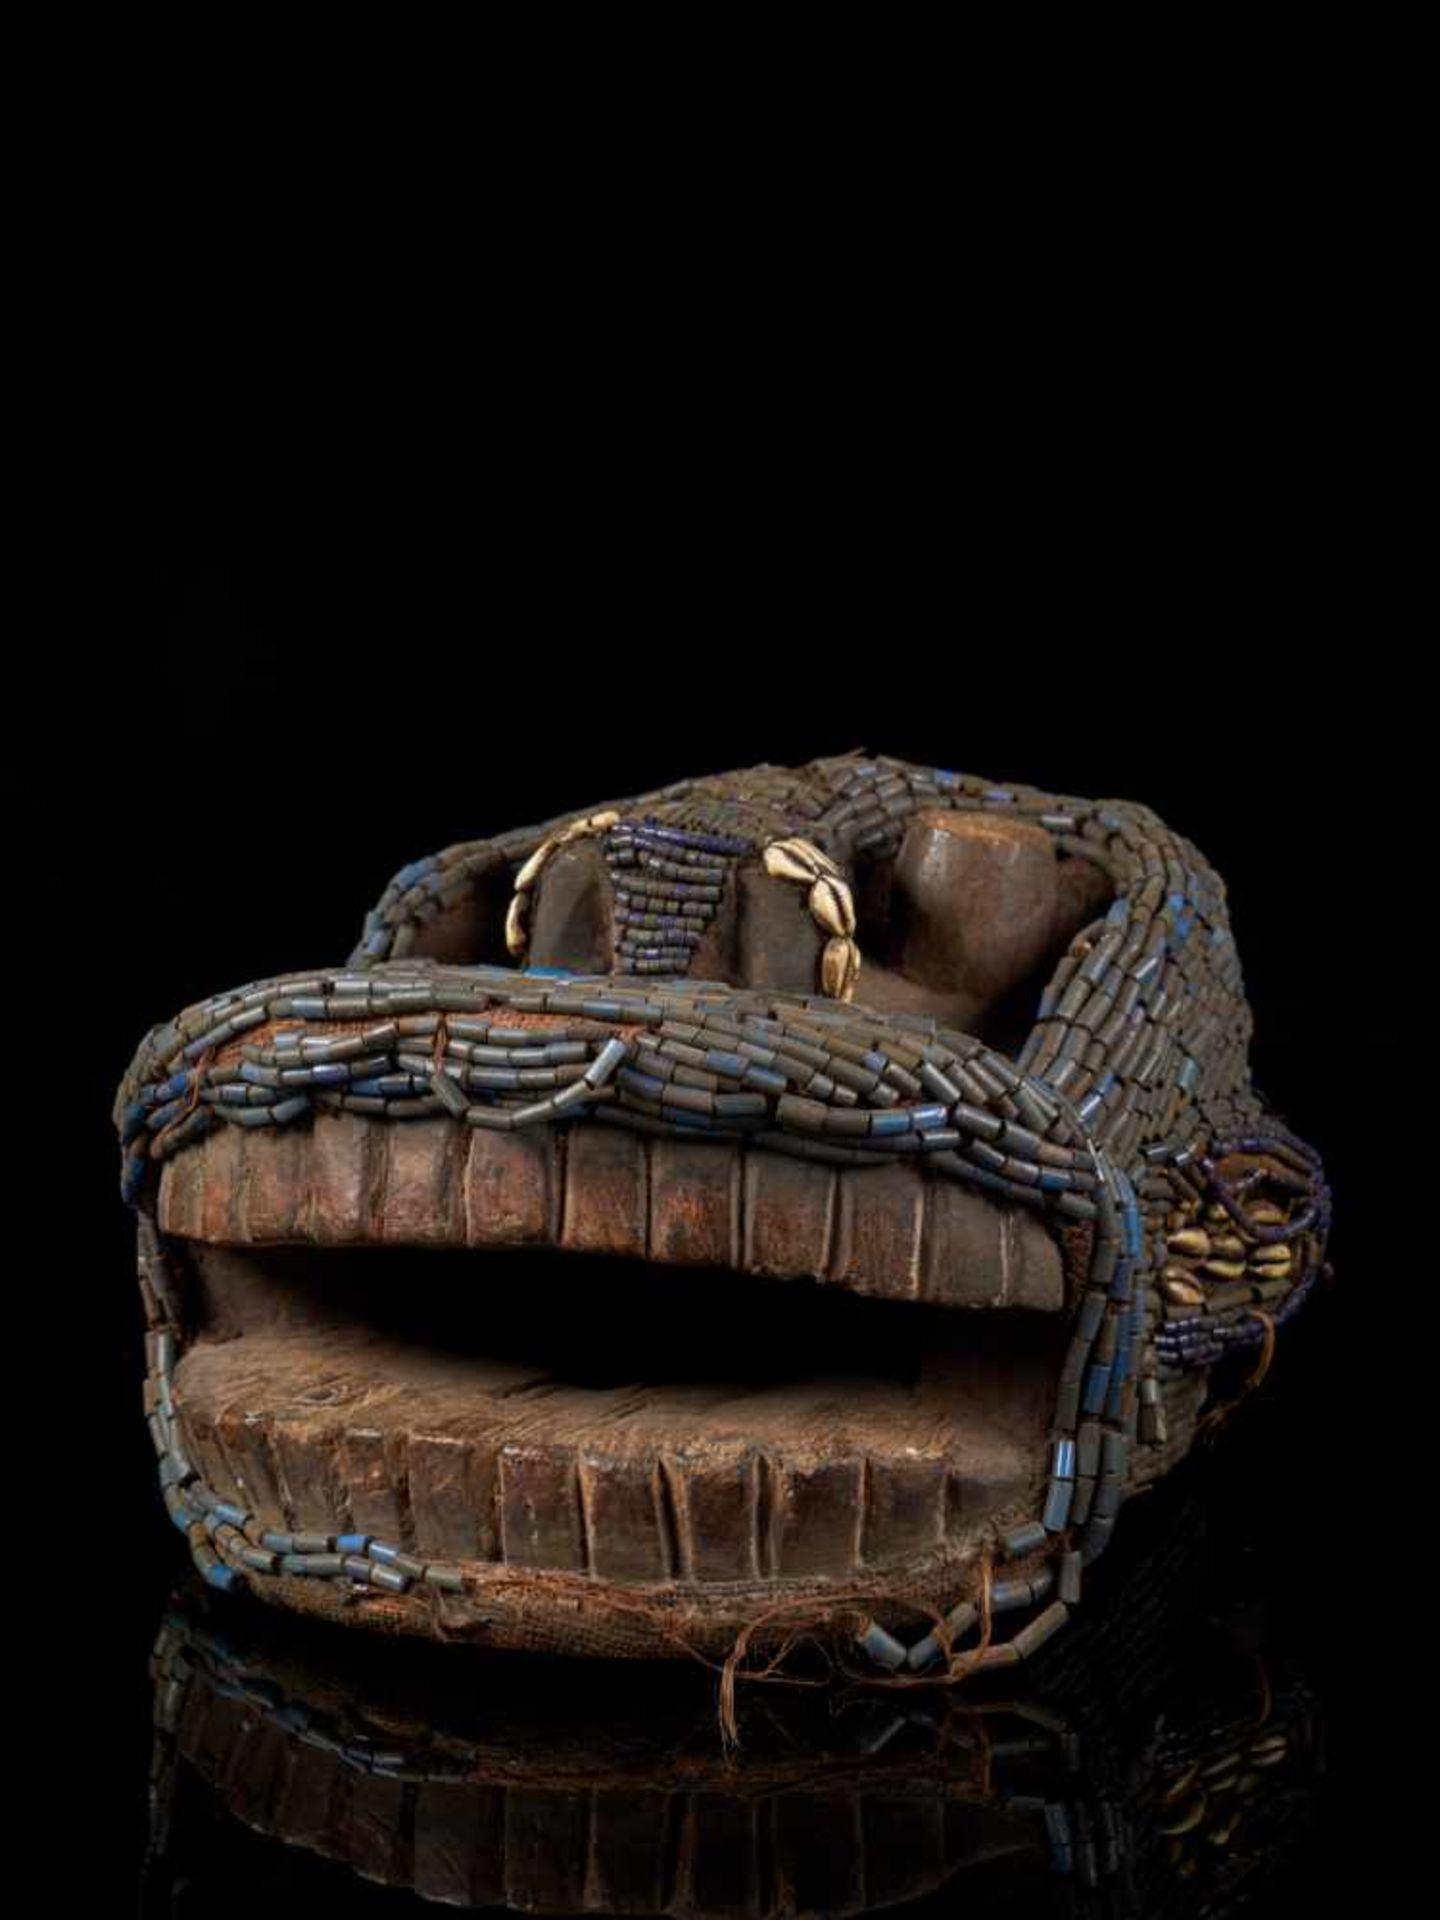 Beaded Gorilla Mask With Wooden Headdress - Tribal ArtA beautiful gorilla mask fashioned from wood - Bild 7 aus 7